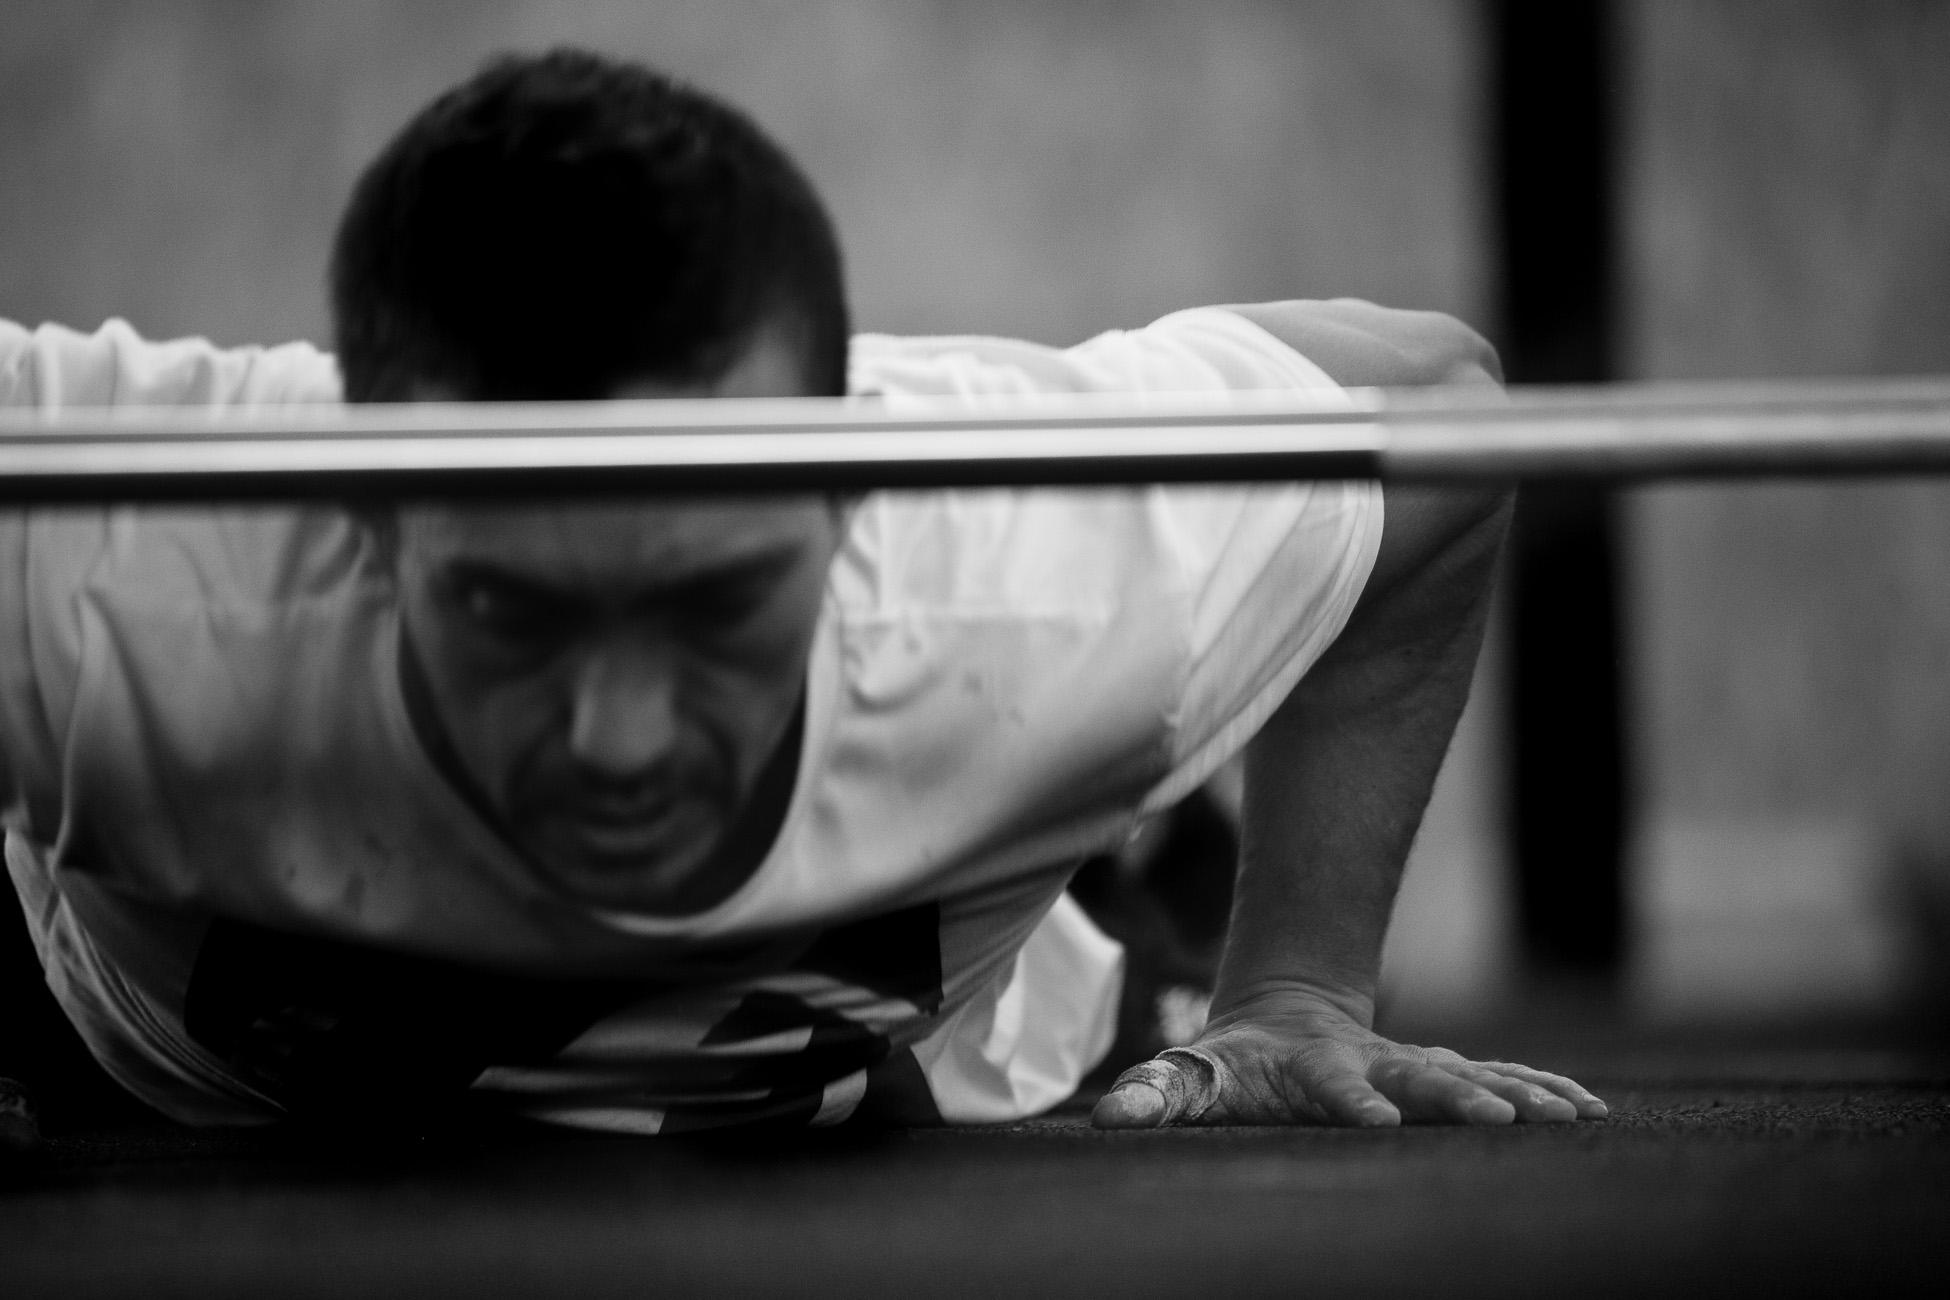 crossfit-games-open-fitness-atleta-fotografia-003.jpg